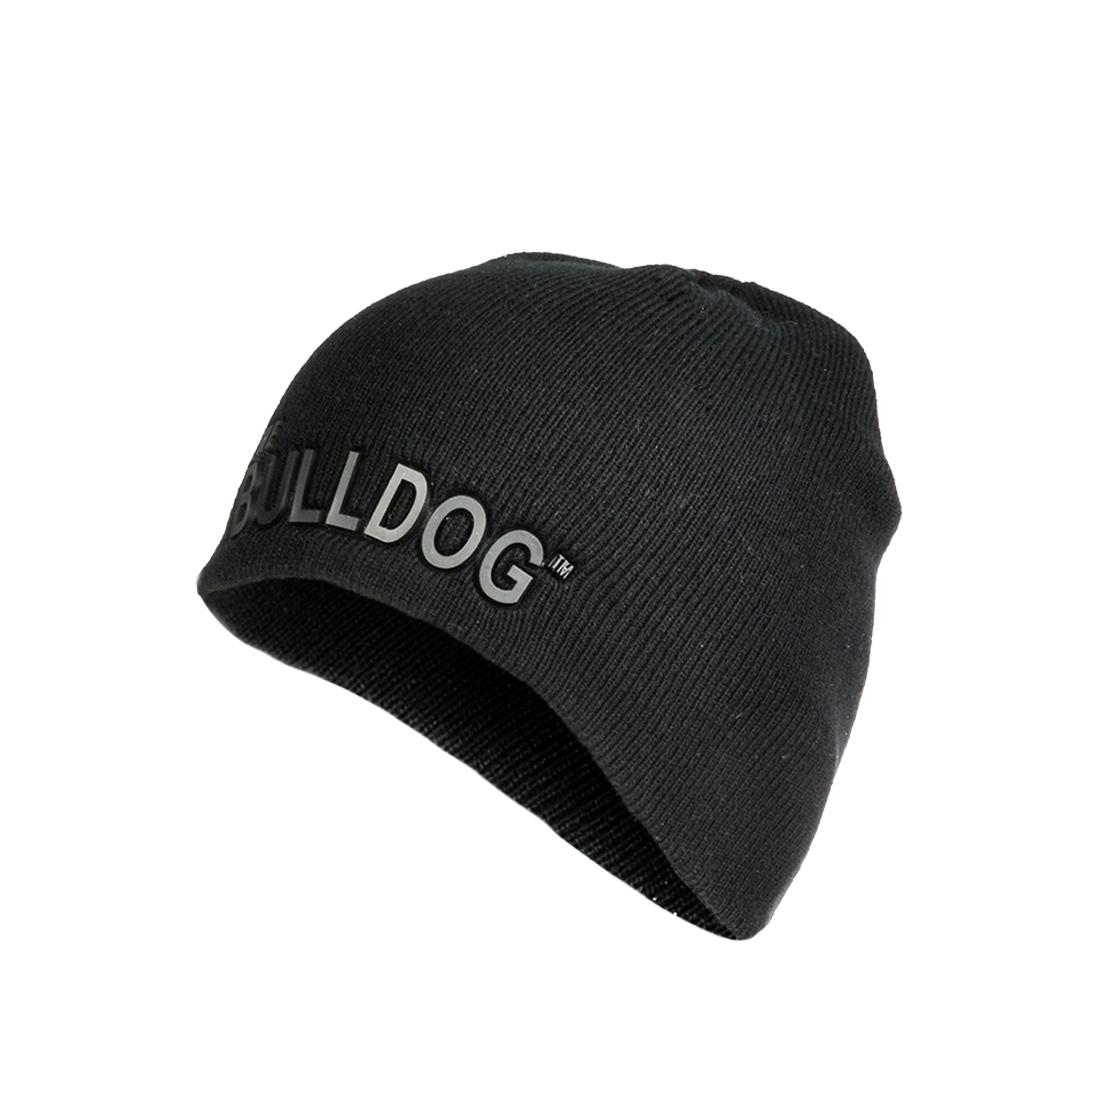 bonnet the bulldog